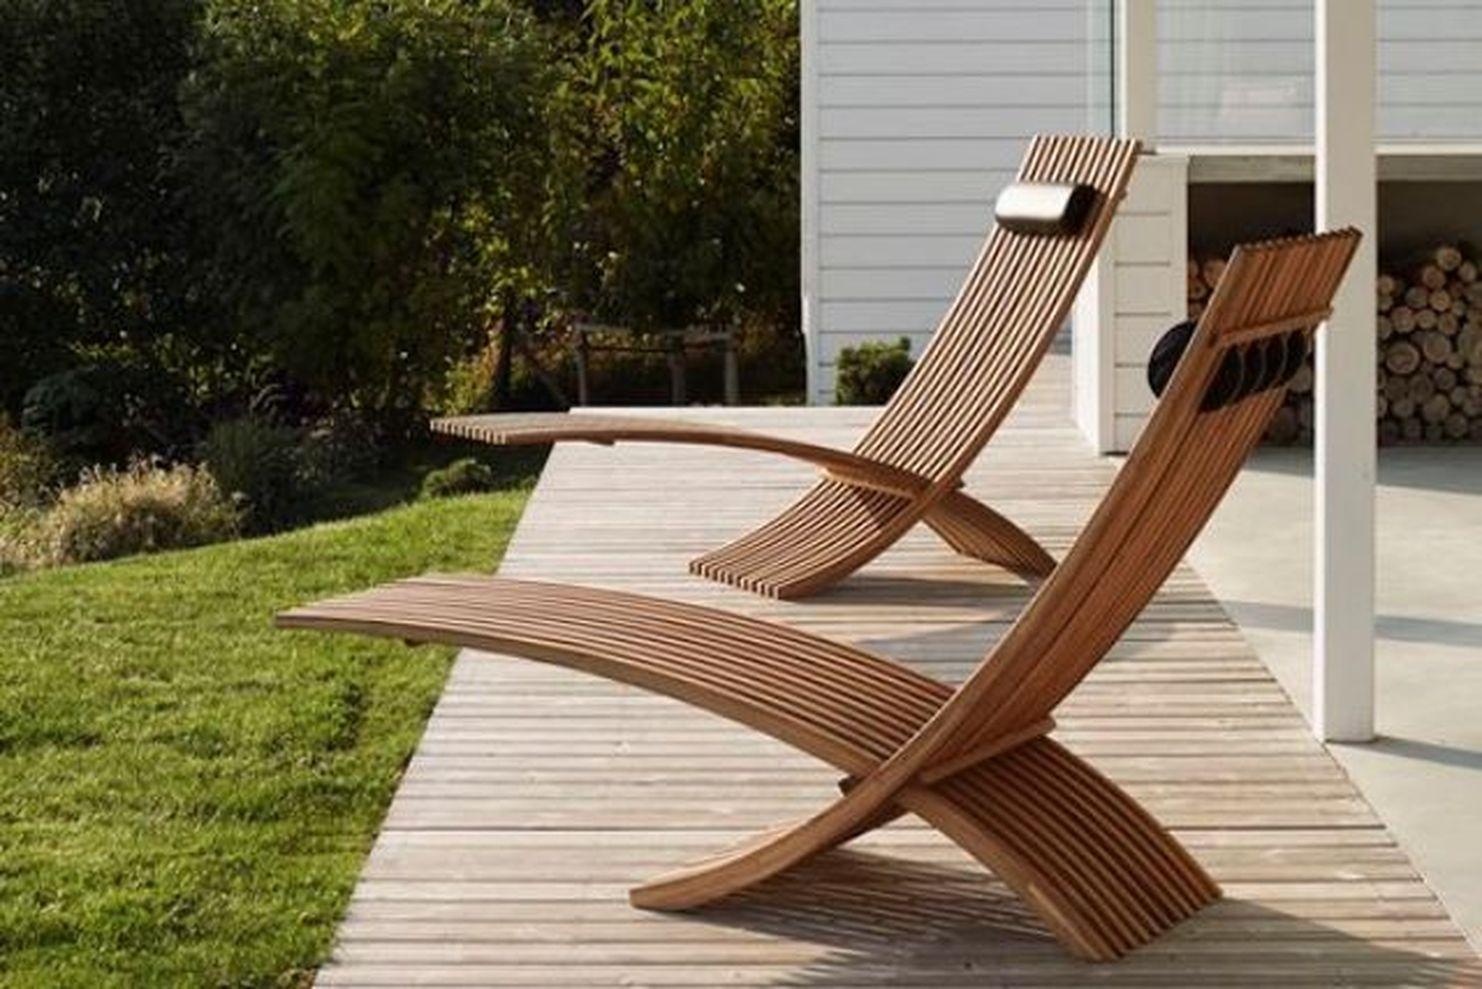 86 Stylish Small Patio Furniture Ideas - ROUNDECOR